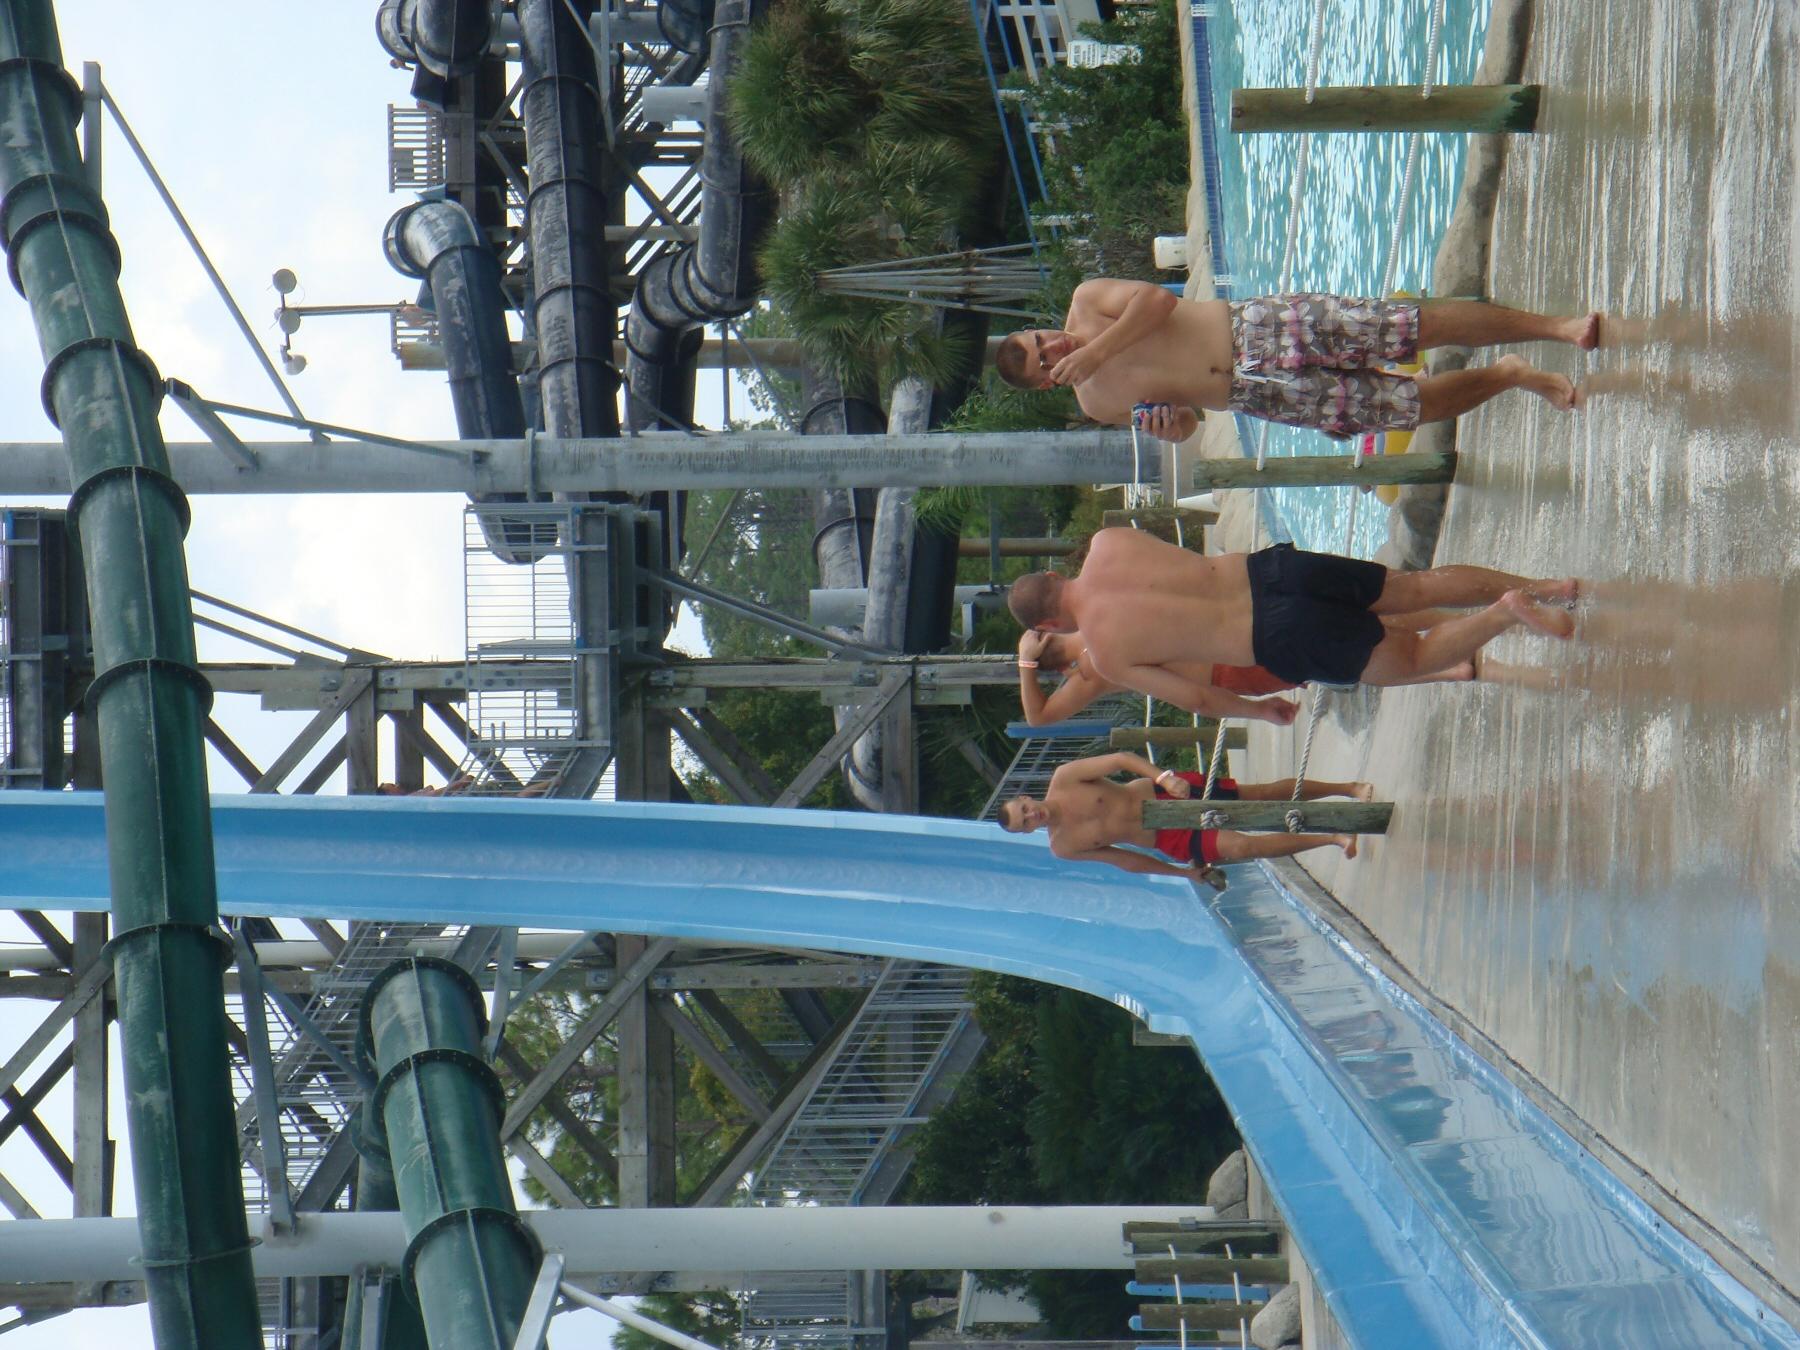 kids at water slide exit